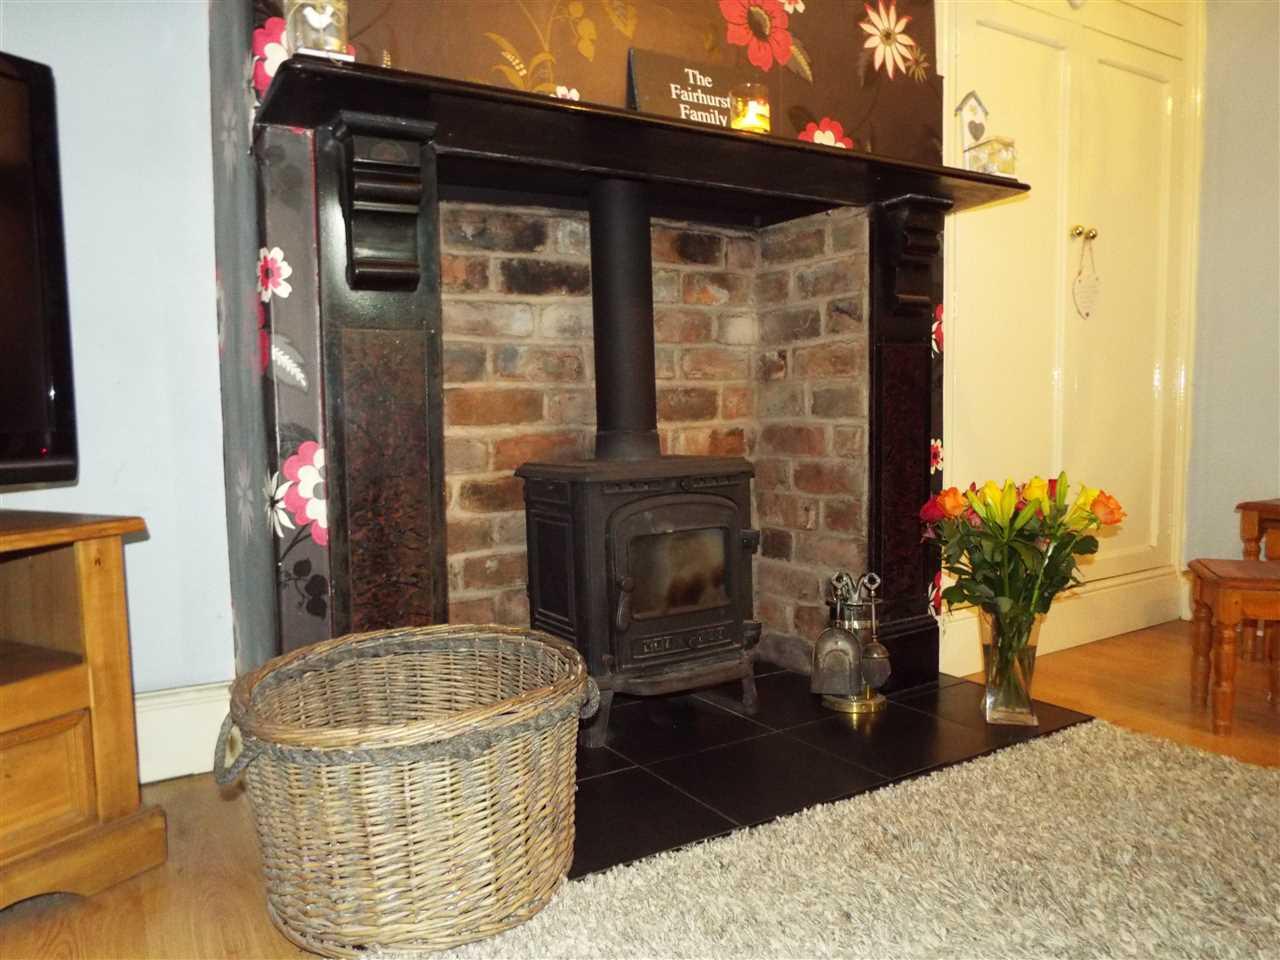 3 bed end-of-terrace for sale in Park Road, Adlington, Adlington 7